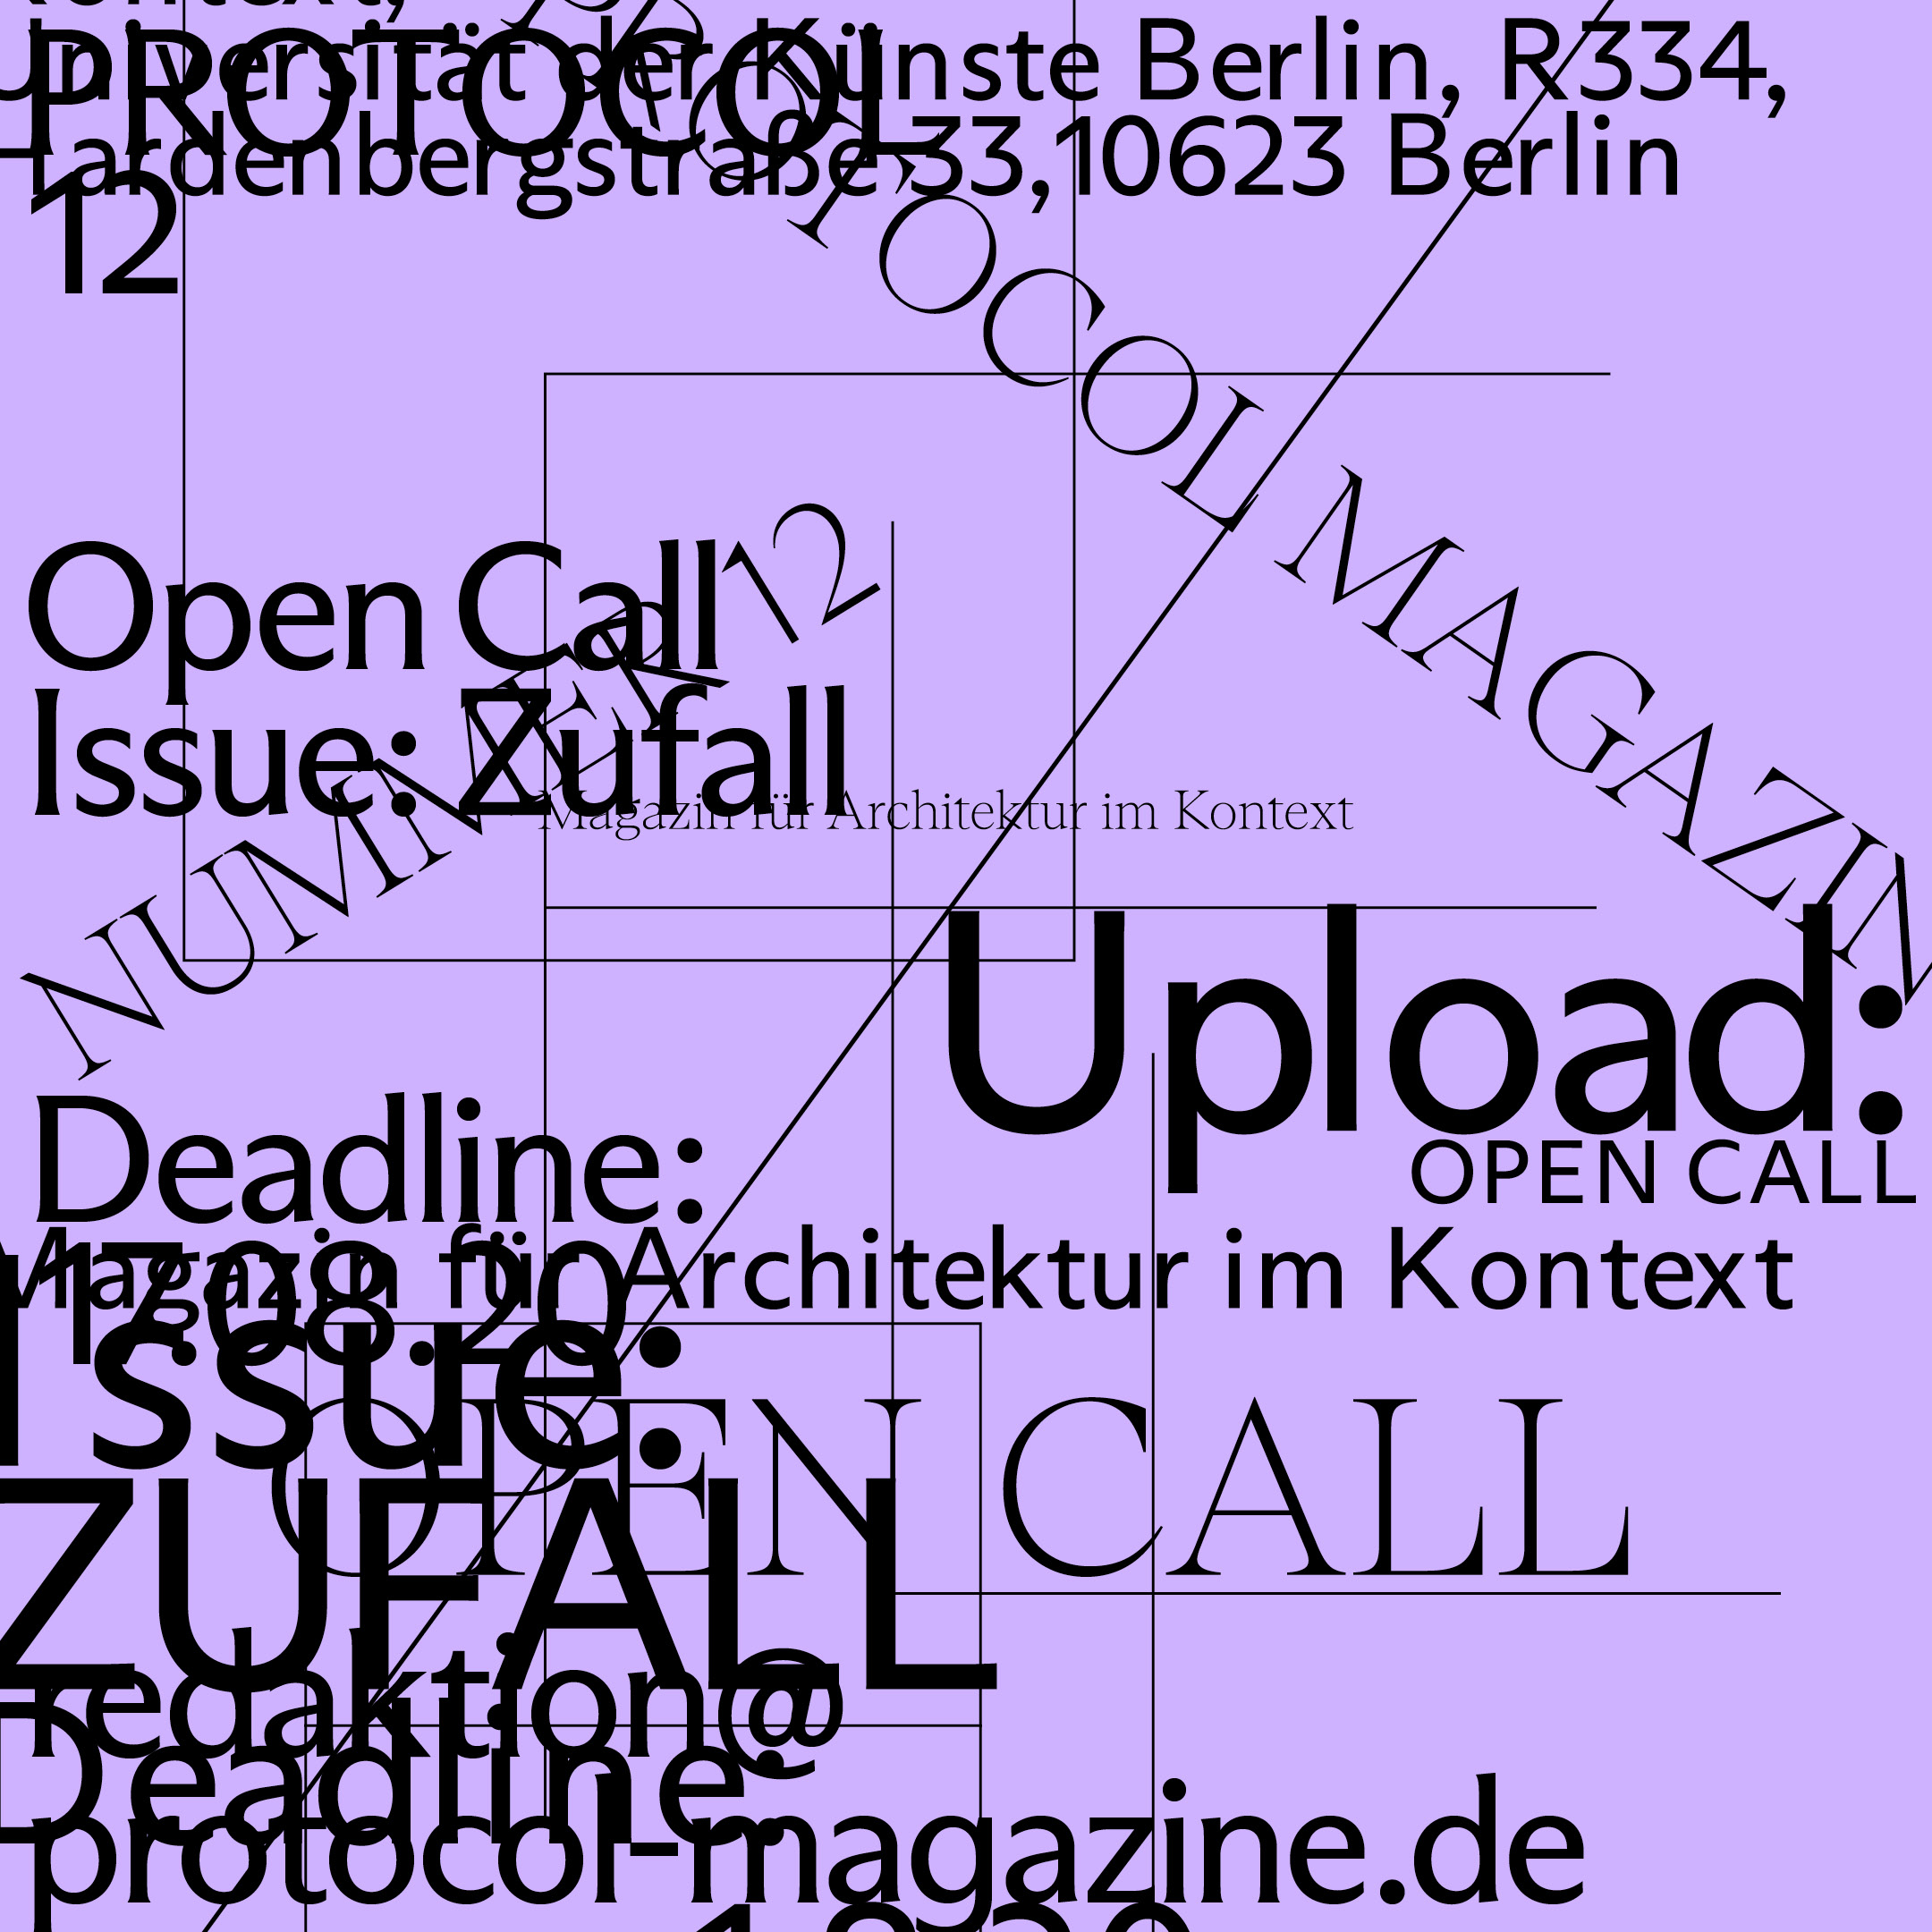 p12_Instagram-Redaktion_Protocol-Magazin_Magazin-fuer-Architektur-im-Kontext2